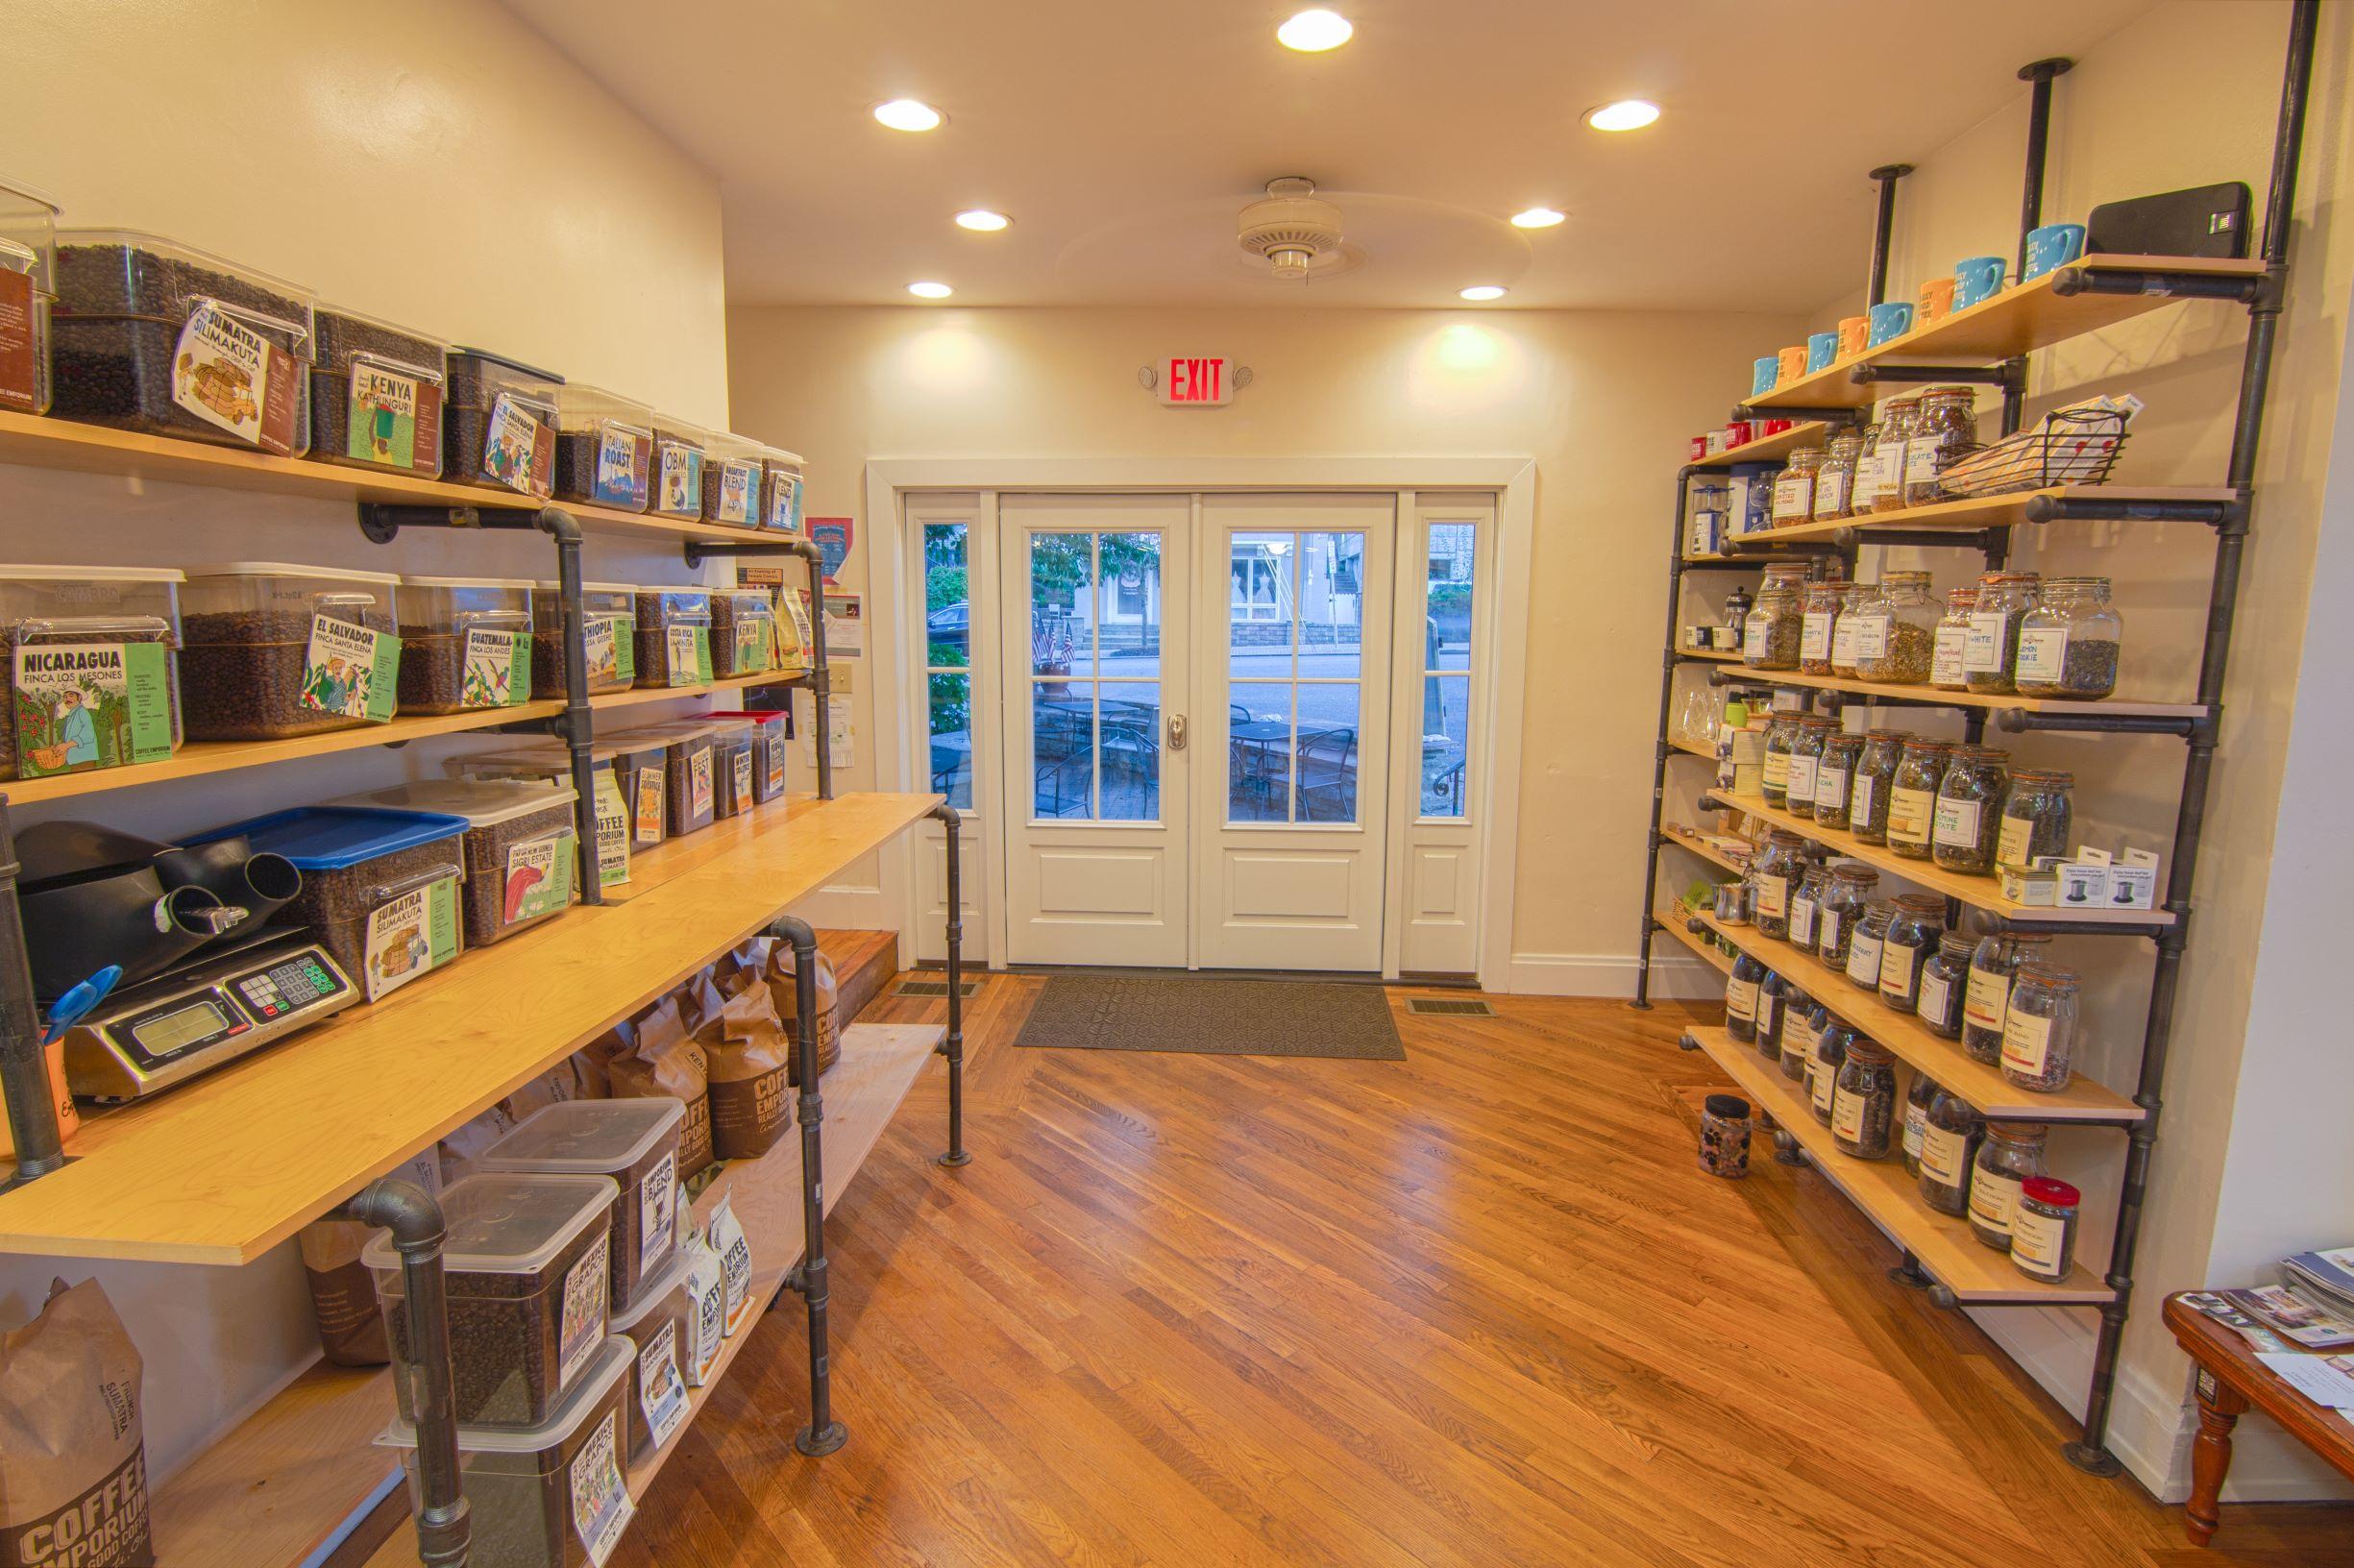 Interior Retail Shelving System